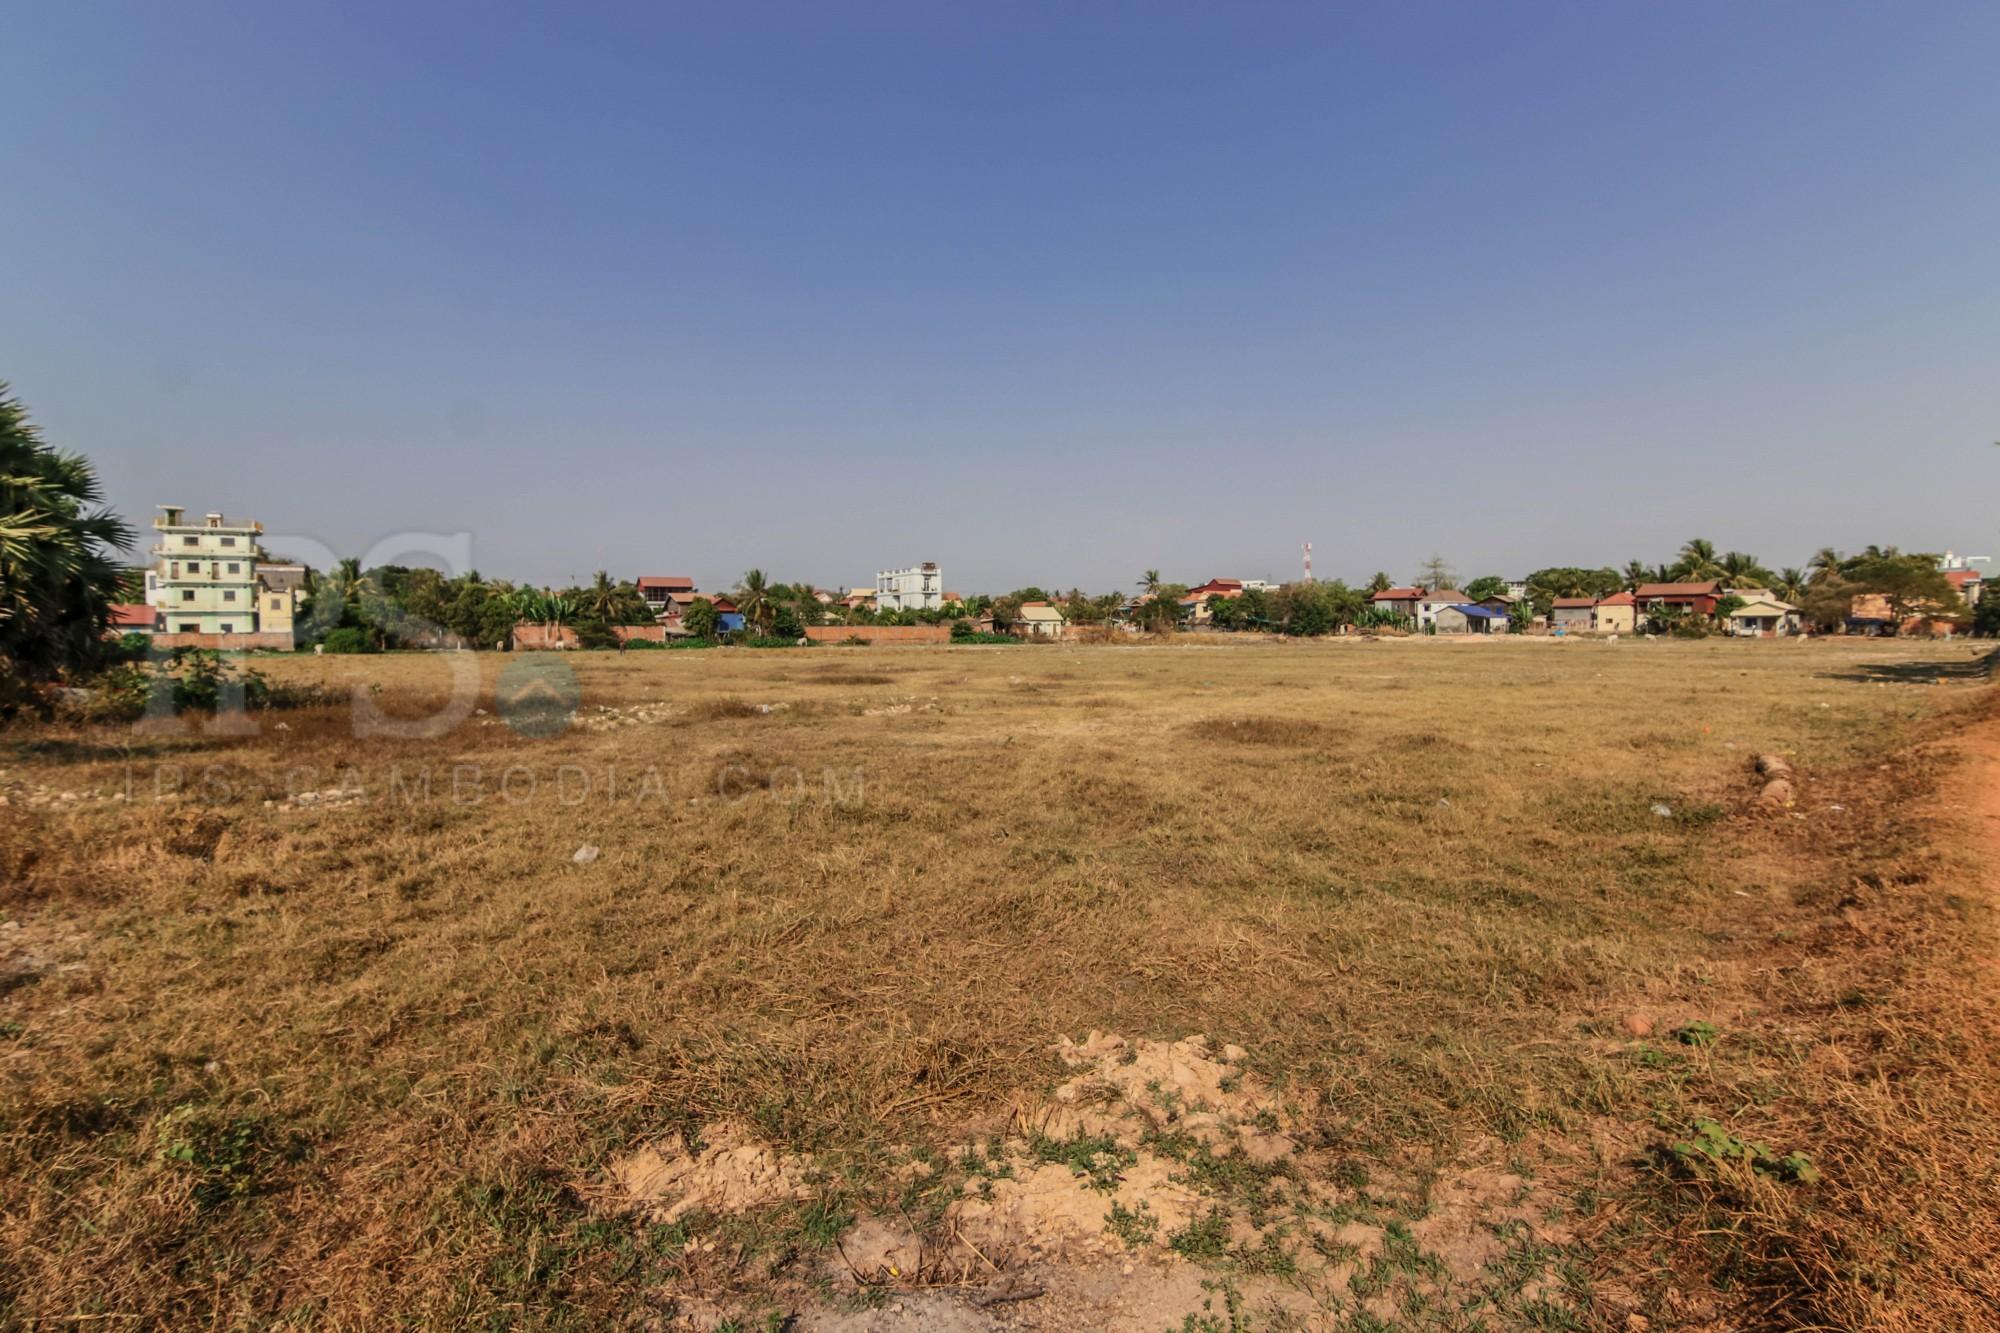 32,118 sq.m. Commercial Land For Sale - Wat Damnak, Siem Reap